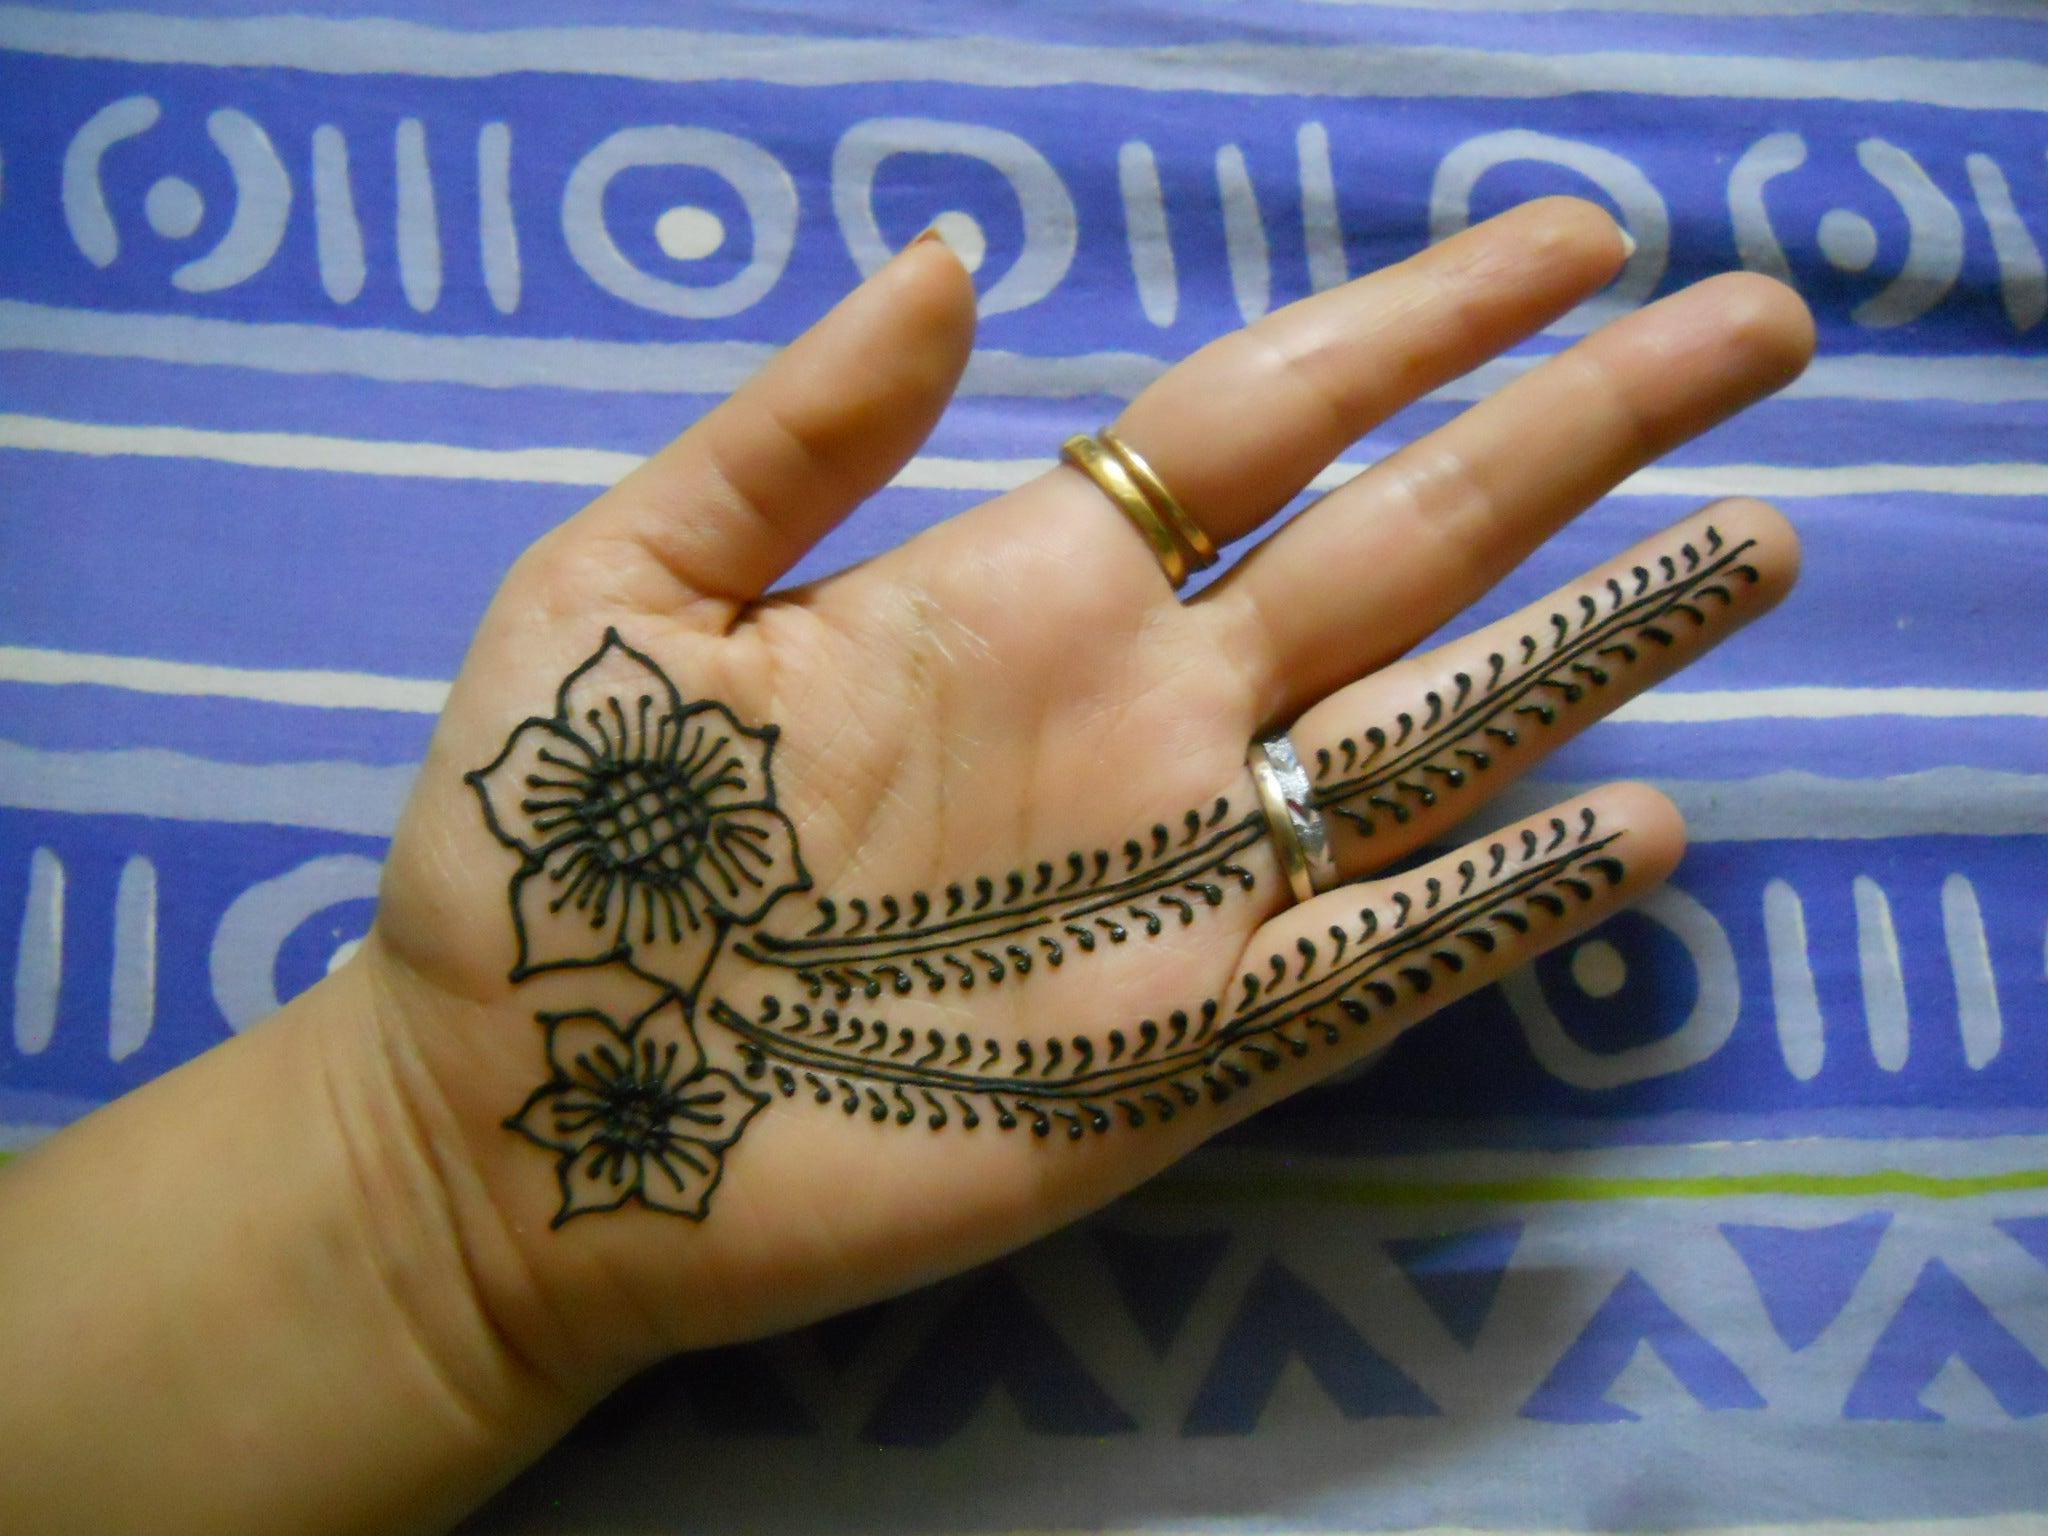 How To Do Henna Design For Beginners 4 Steps Instructables,Spiritual Line Art Geometric Tattoo Designs